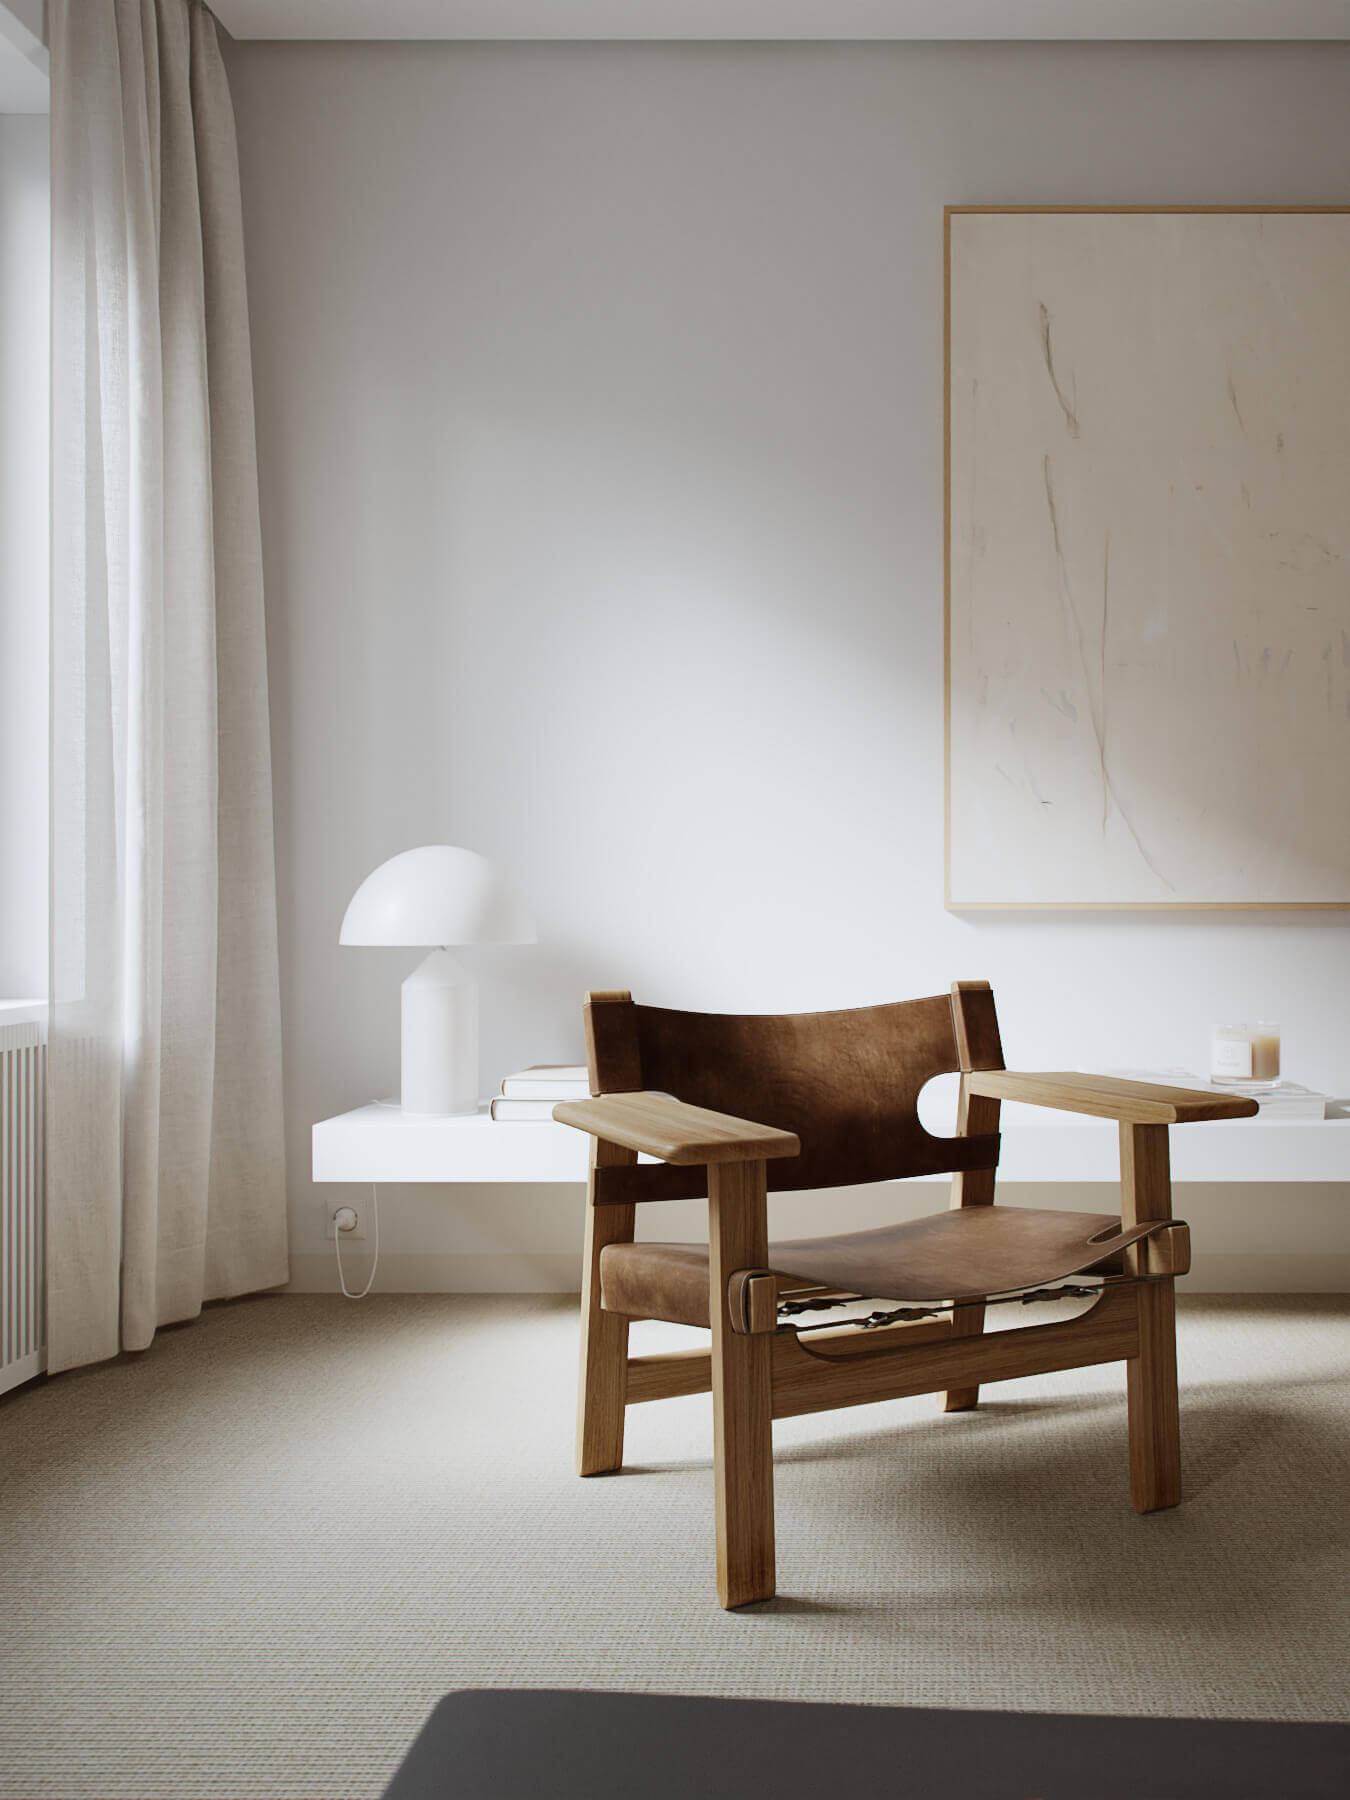 Trendy Living & Kitchen apartment lounge chair - cgi visualization